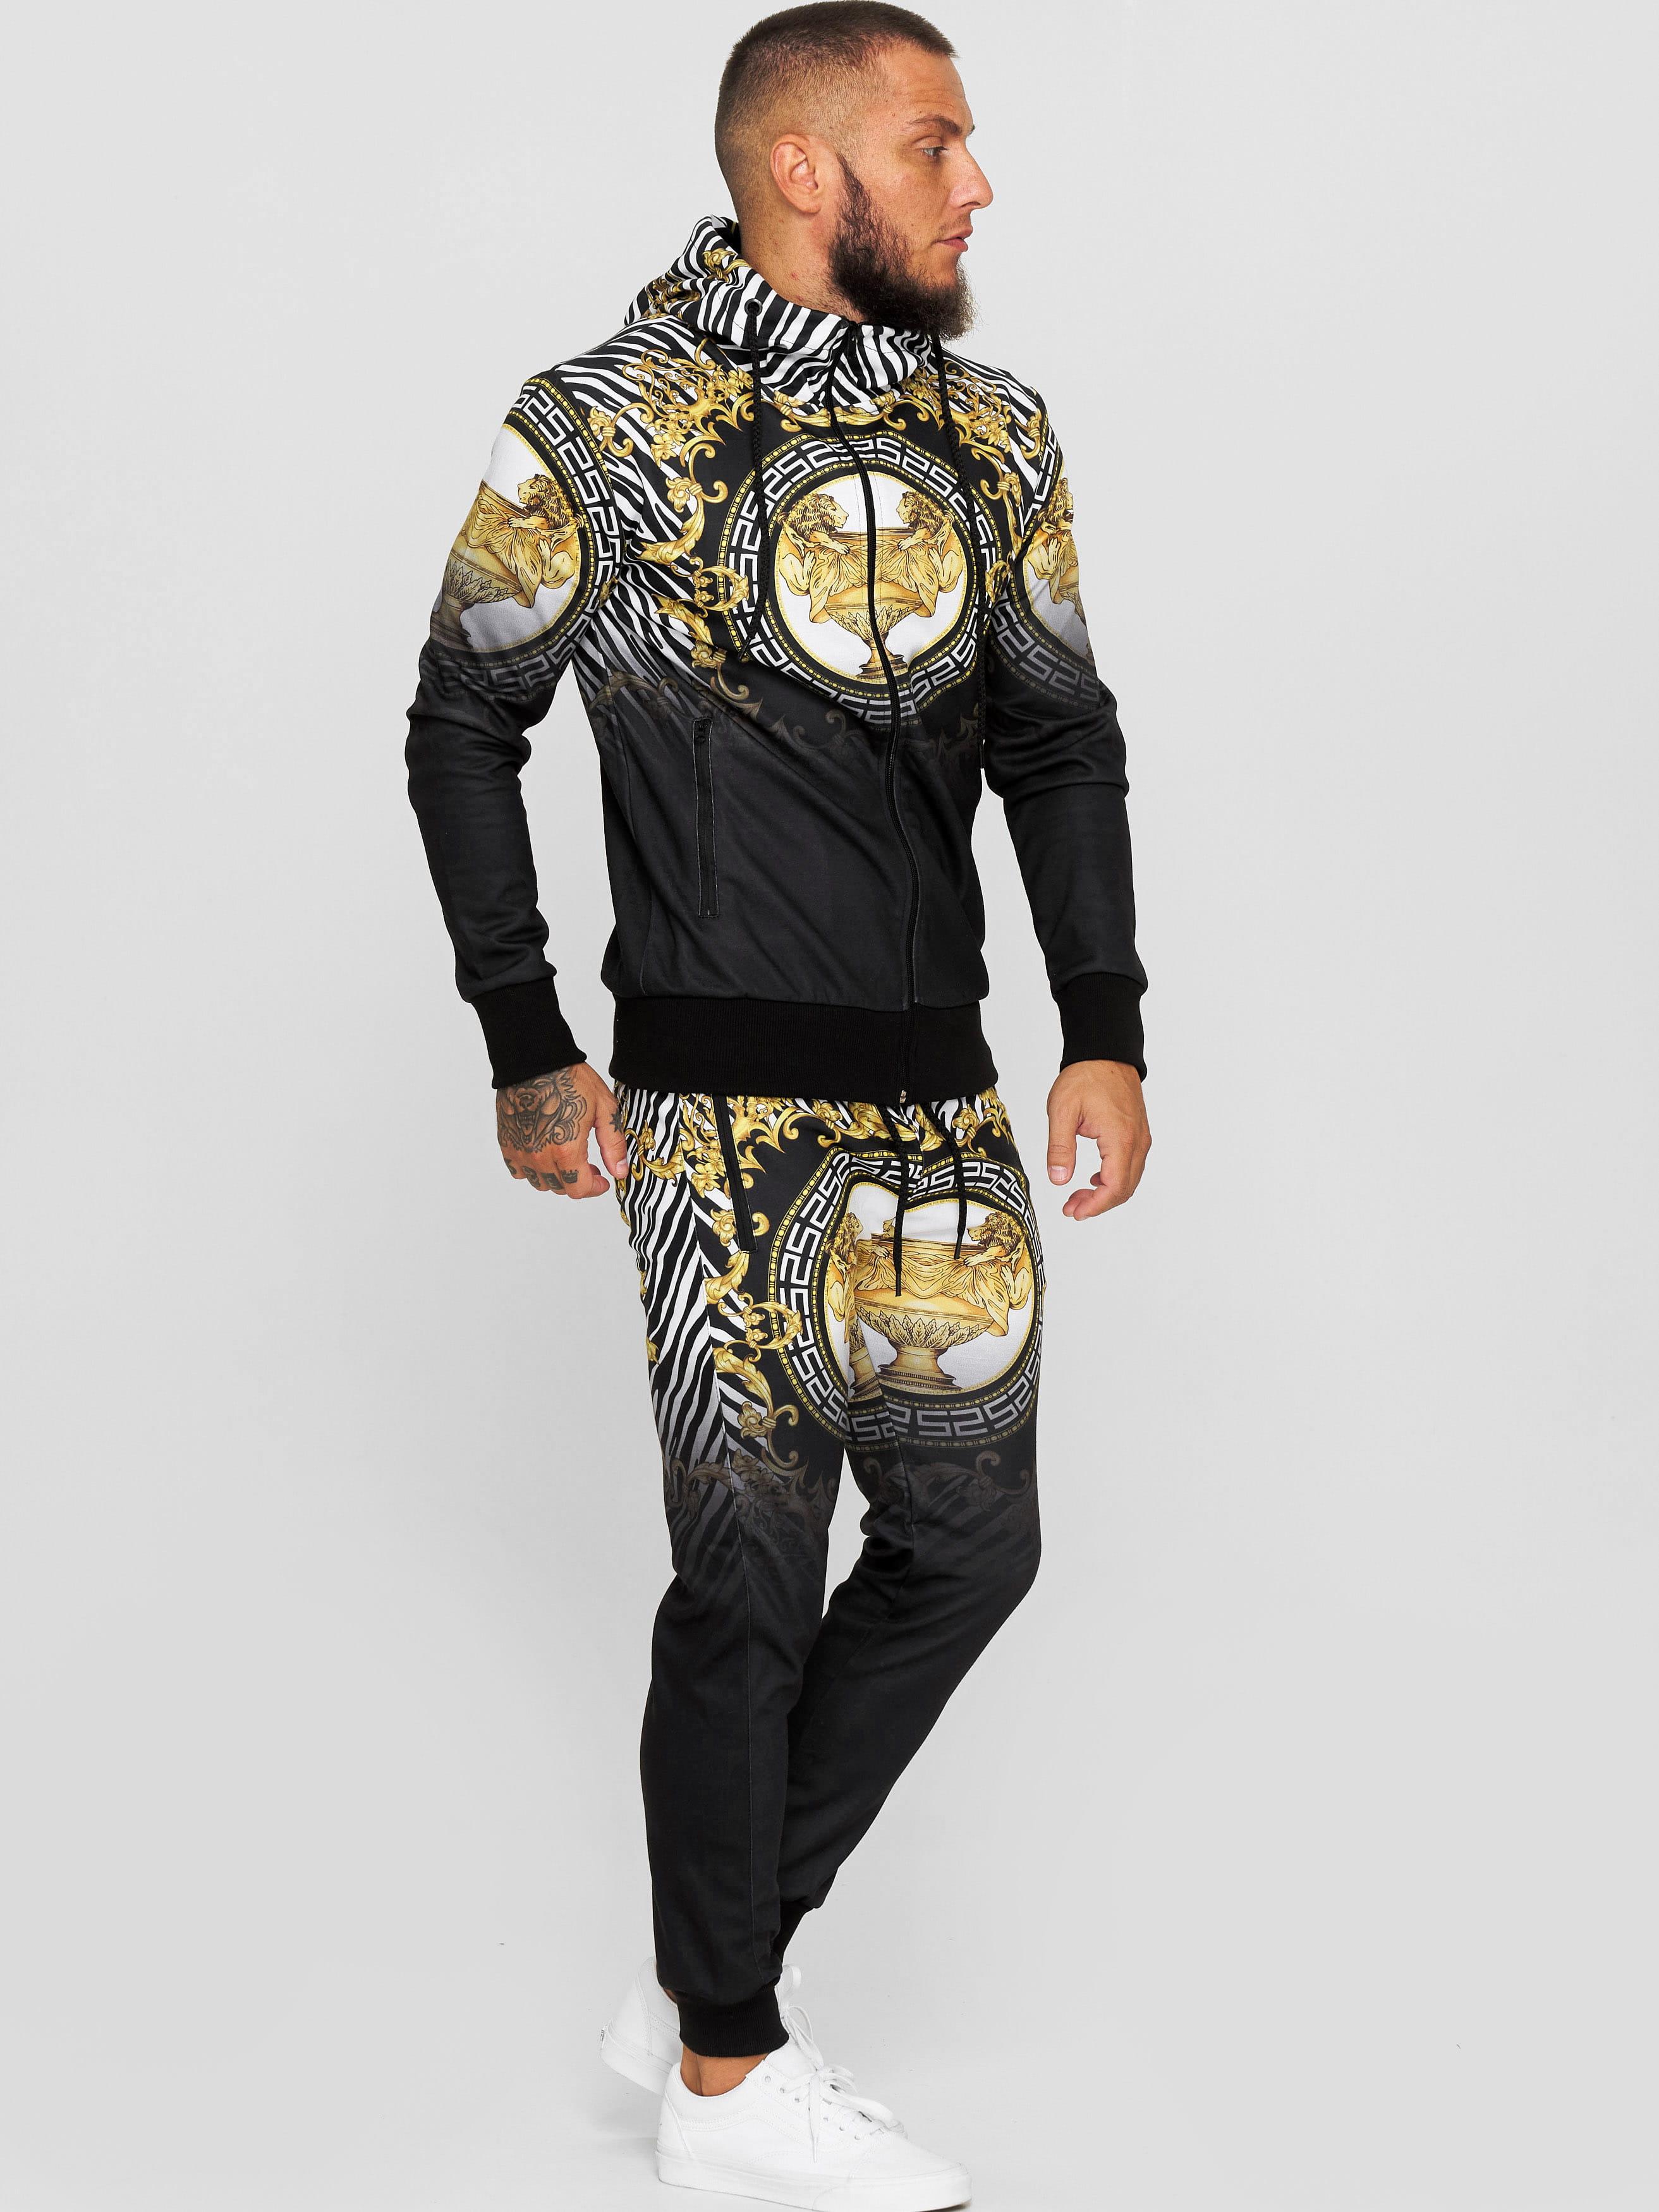 OneRedox Herren Jogginganzug Trainingsanzug M/änner Sportanzug Fitness Outfit Streetwear Tracksuit Jogginghose Hoodie-Sporthose Sportkleidung Comfort Fit Modell JG-1571C